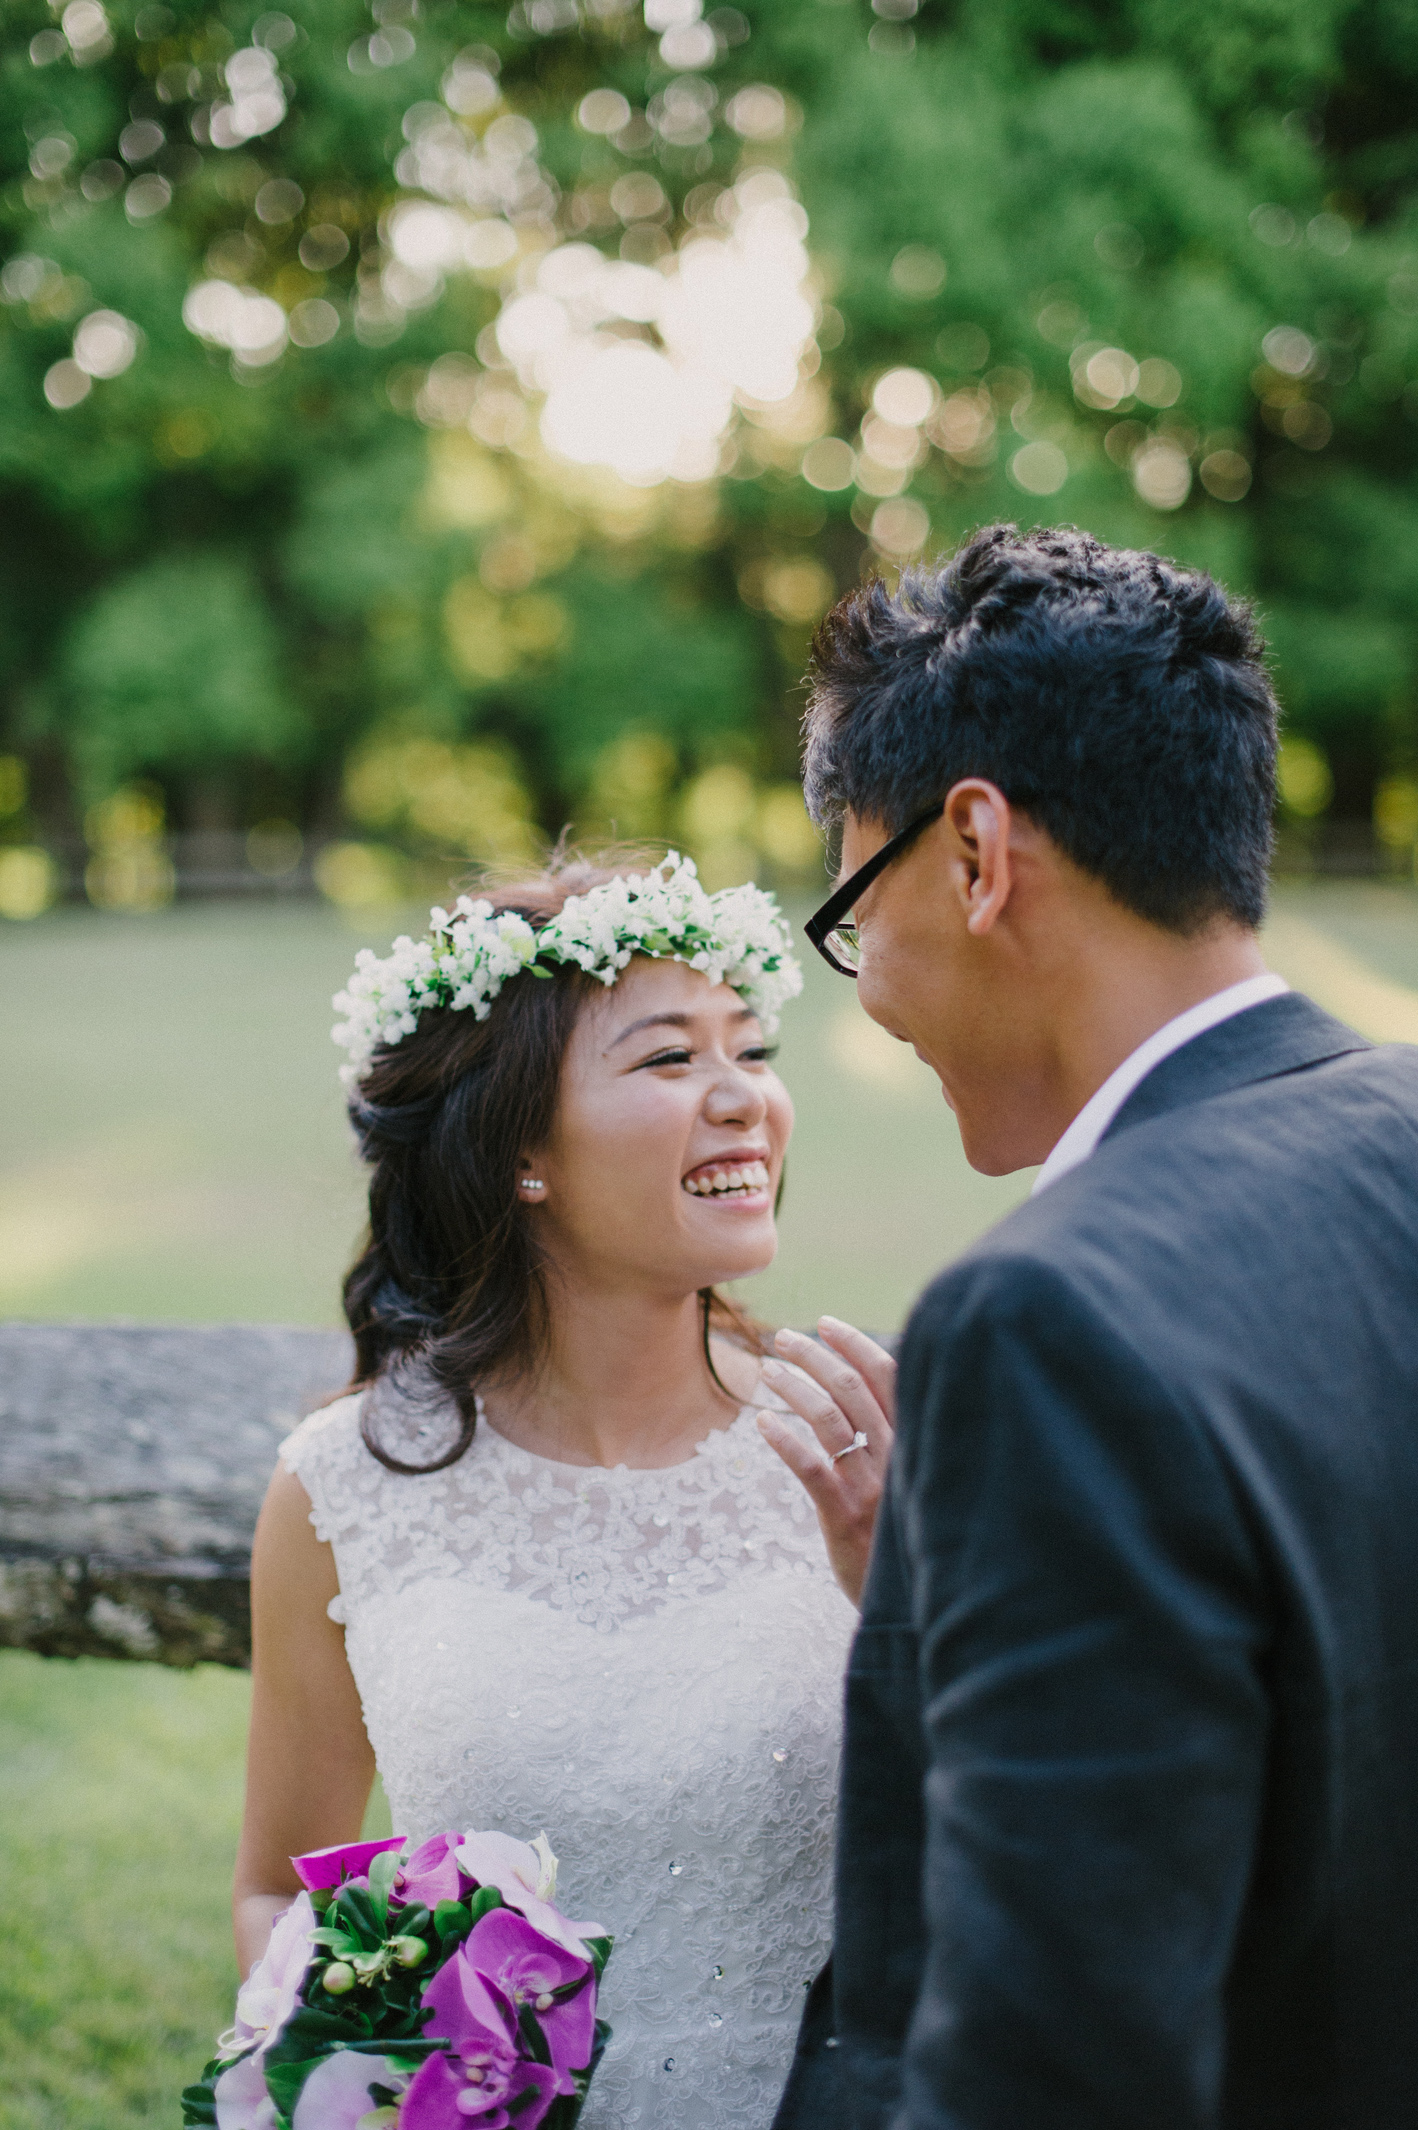 010-ed-janet-currumbin-wedding_sophie-baker-photography